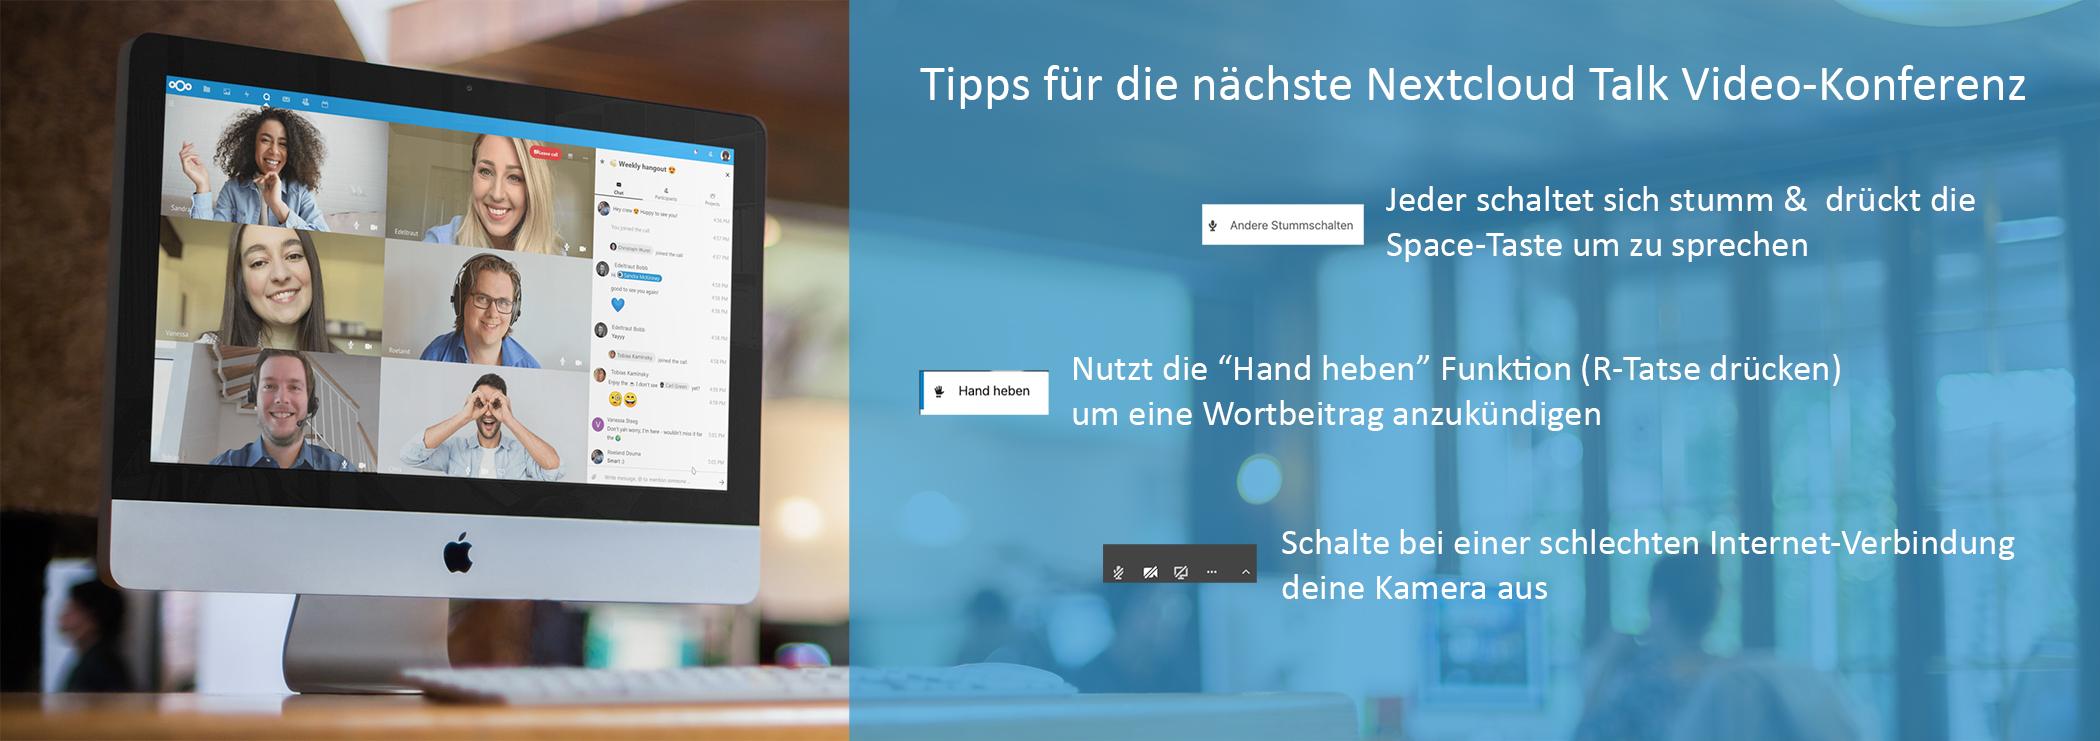 Nextcloud Talk Tipps